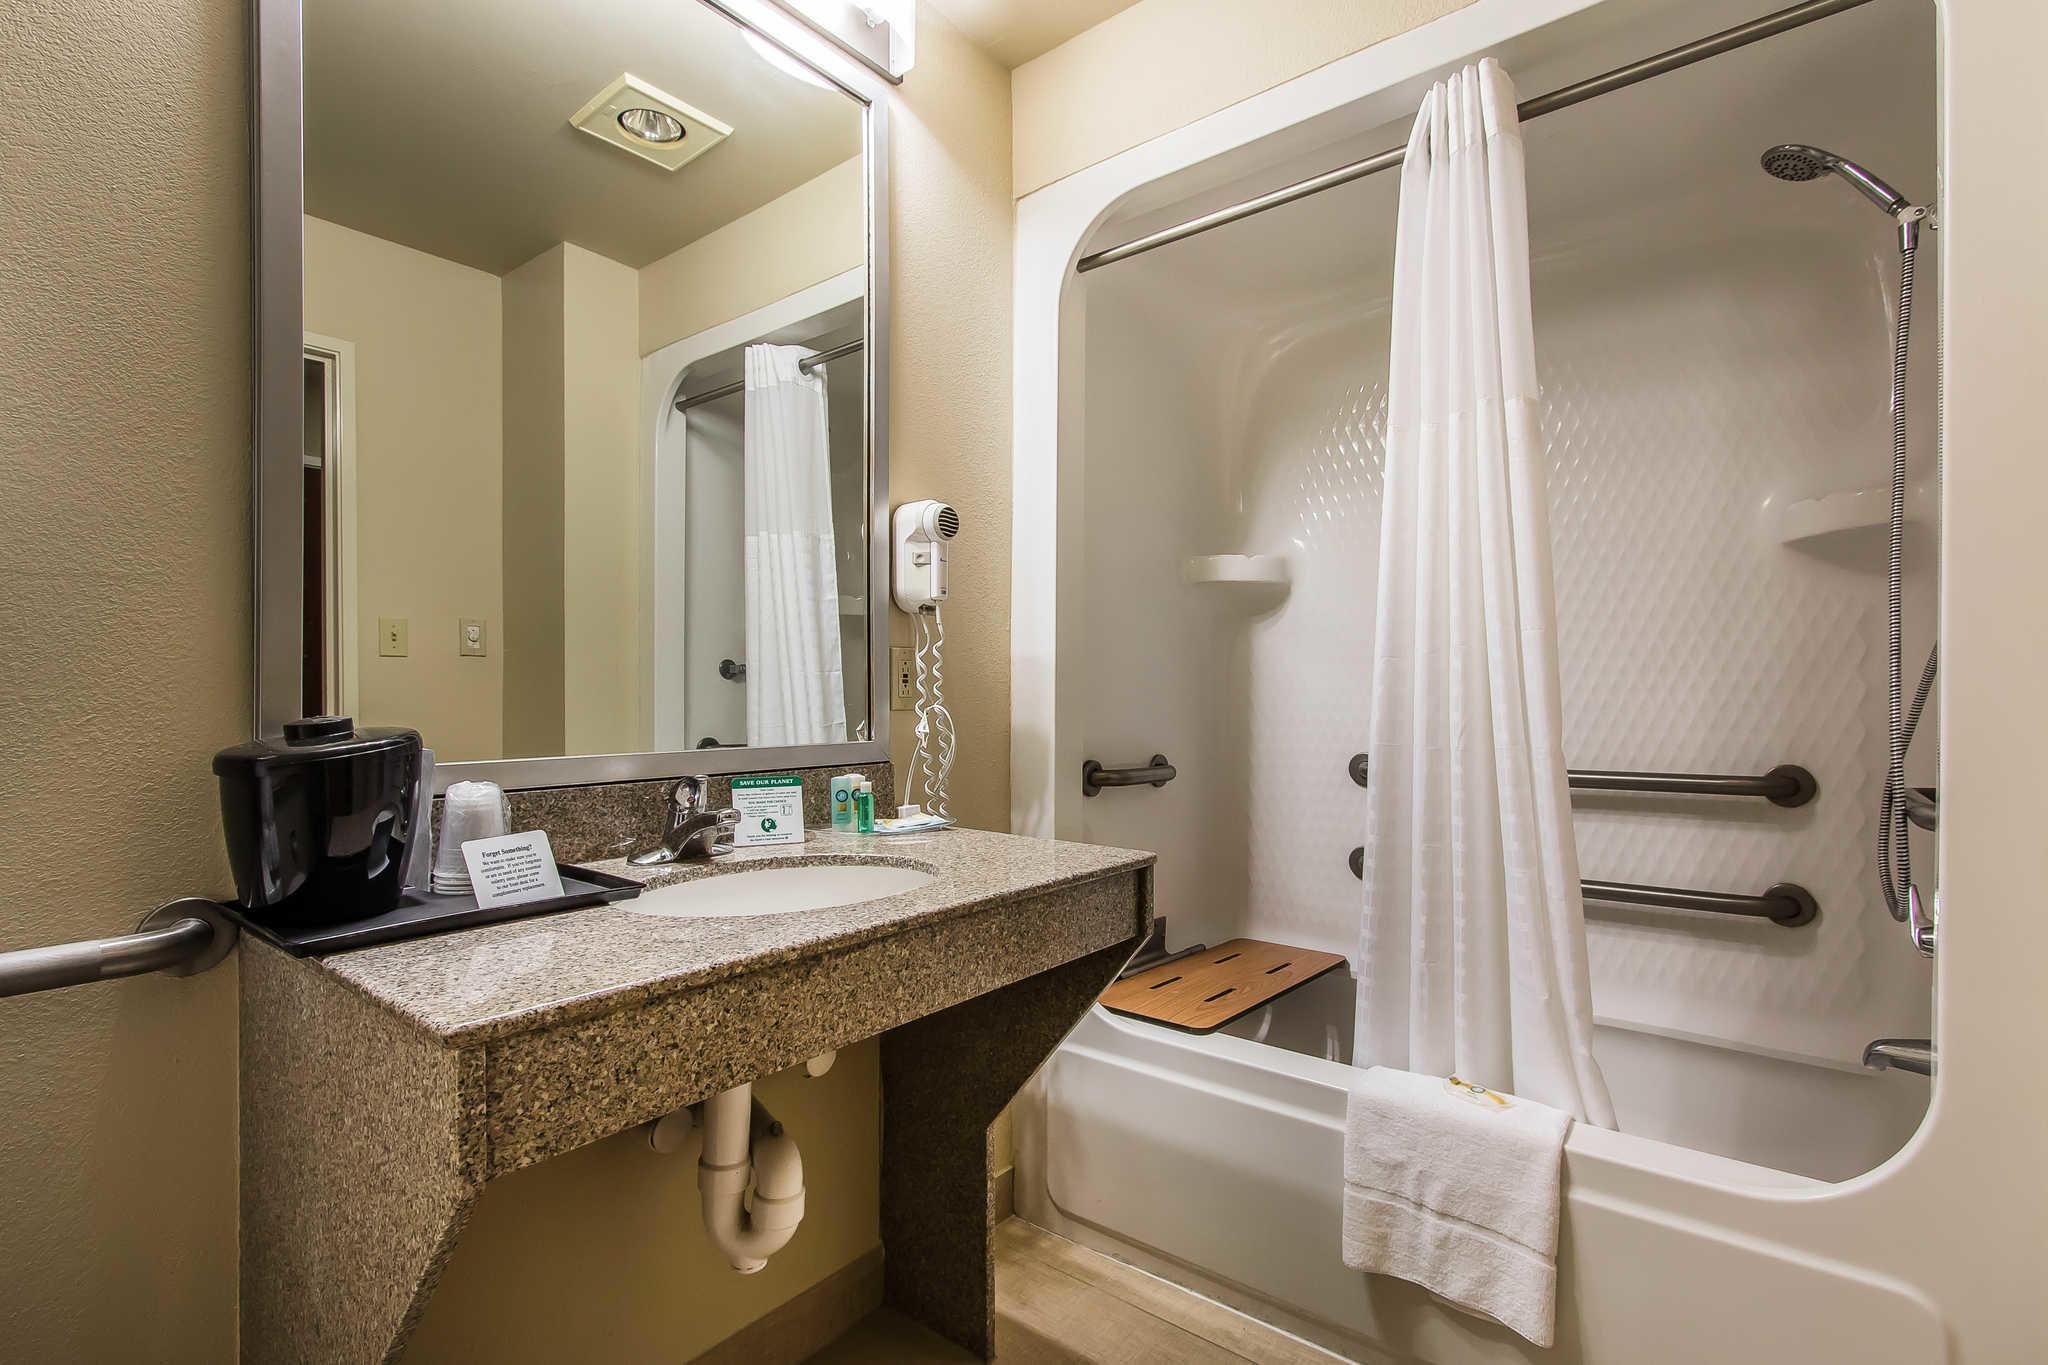 Quality Suites image 7